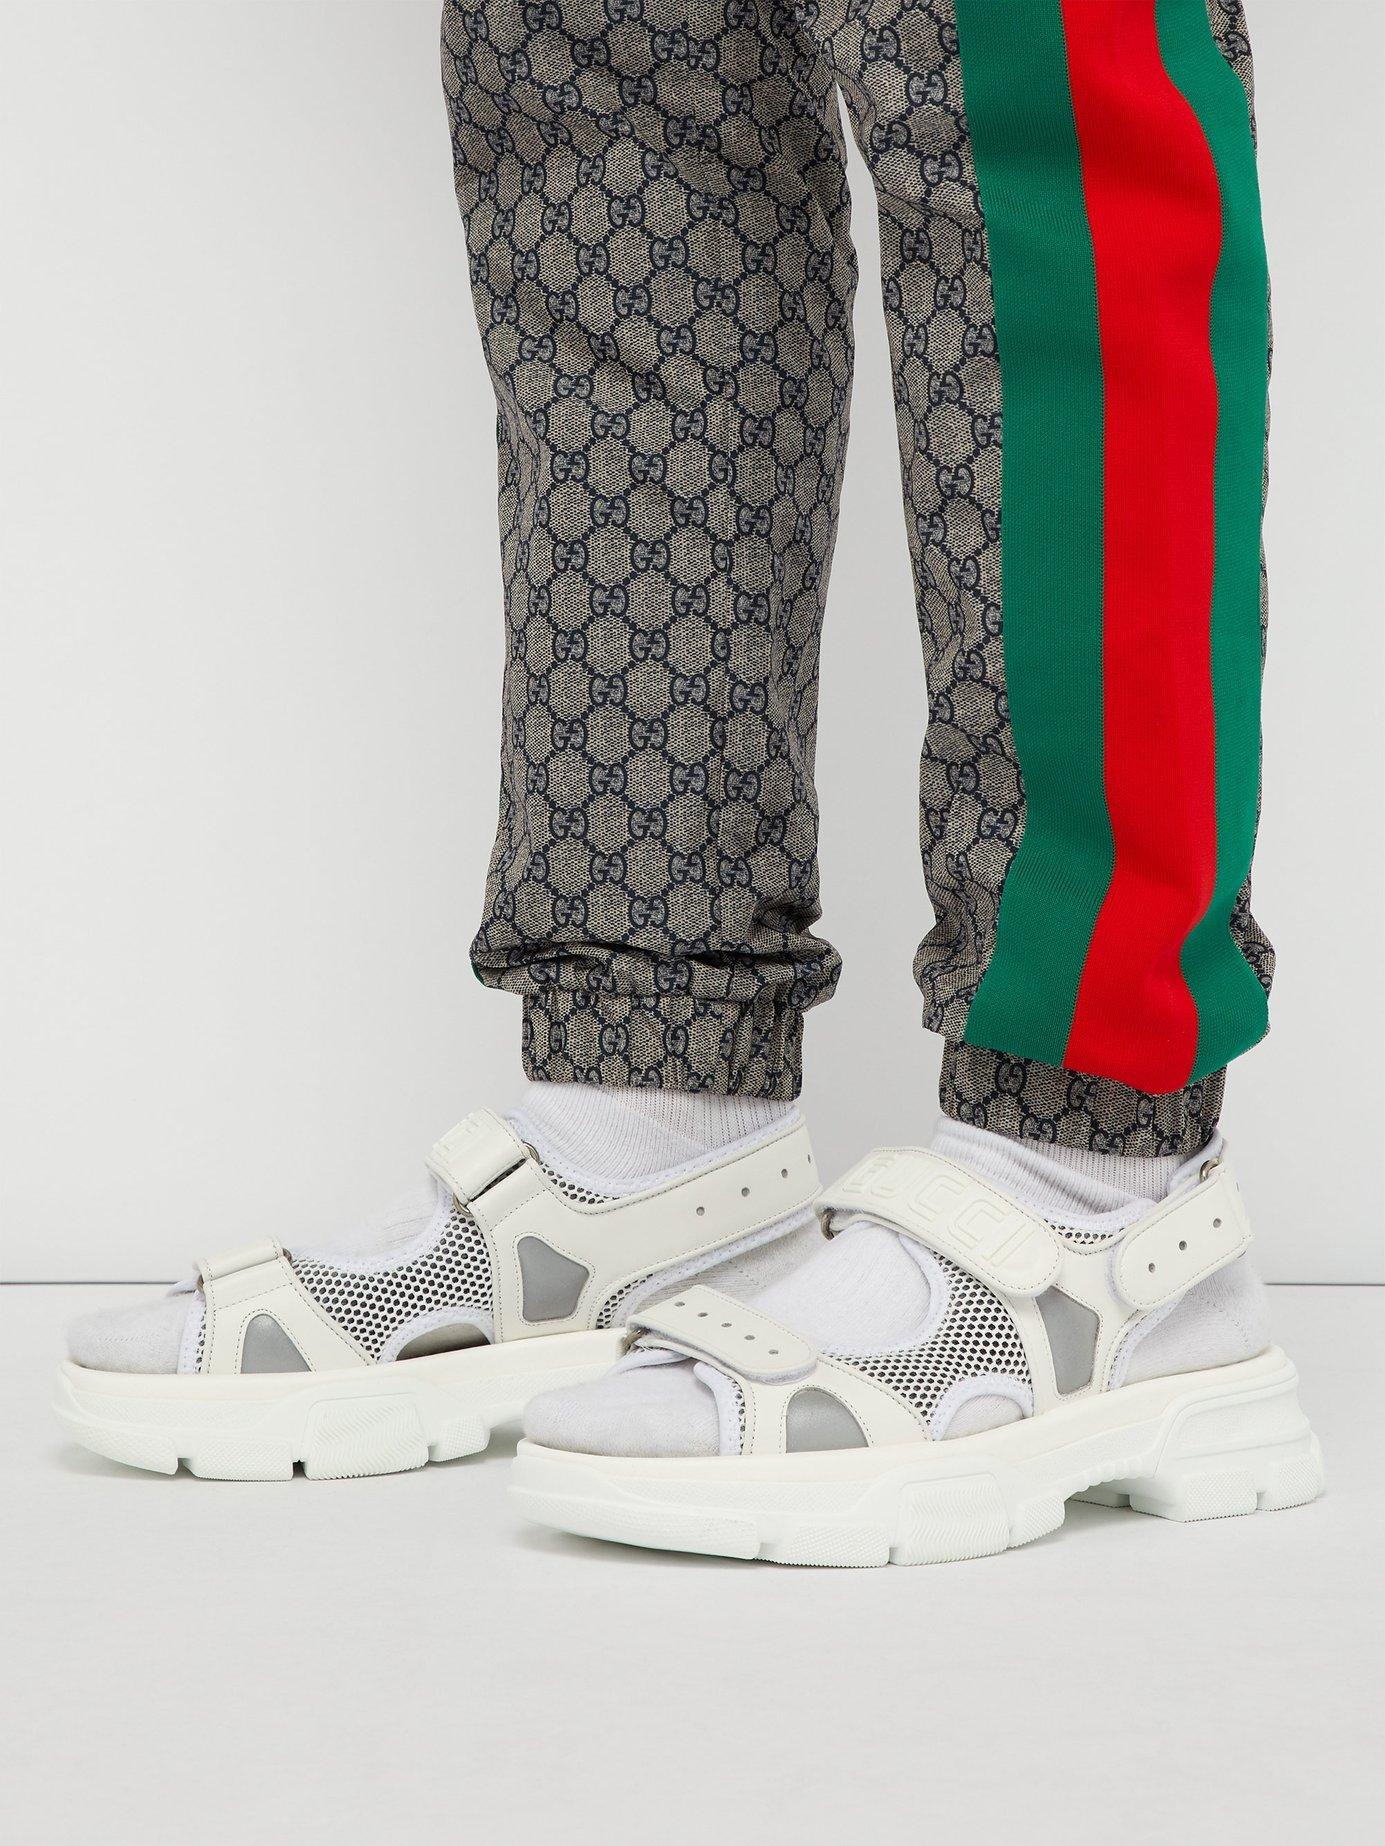 5cbf904ec Gucci White Leather And Mesh Sandals for men. View fullscreen